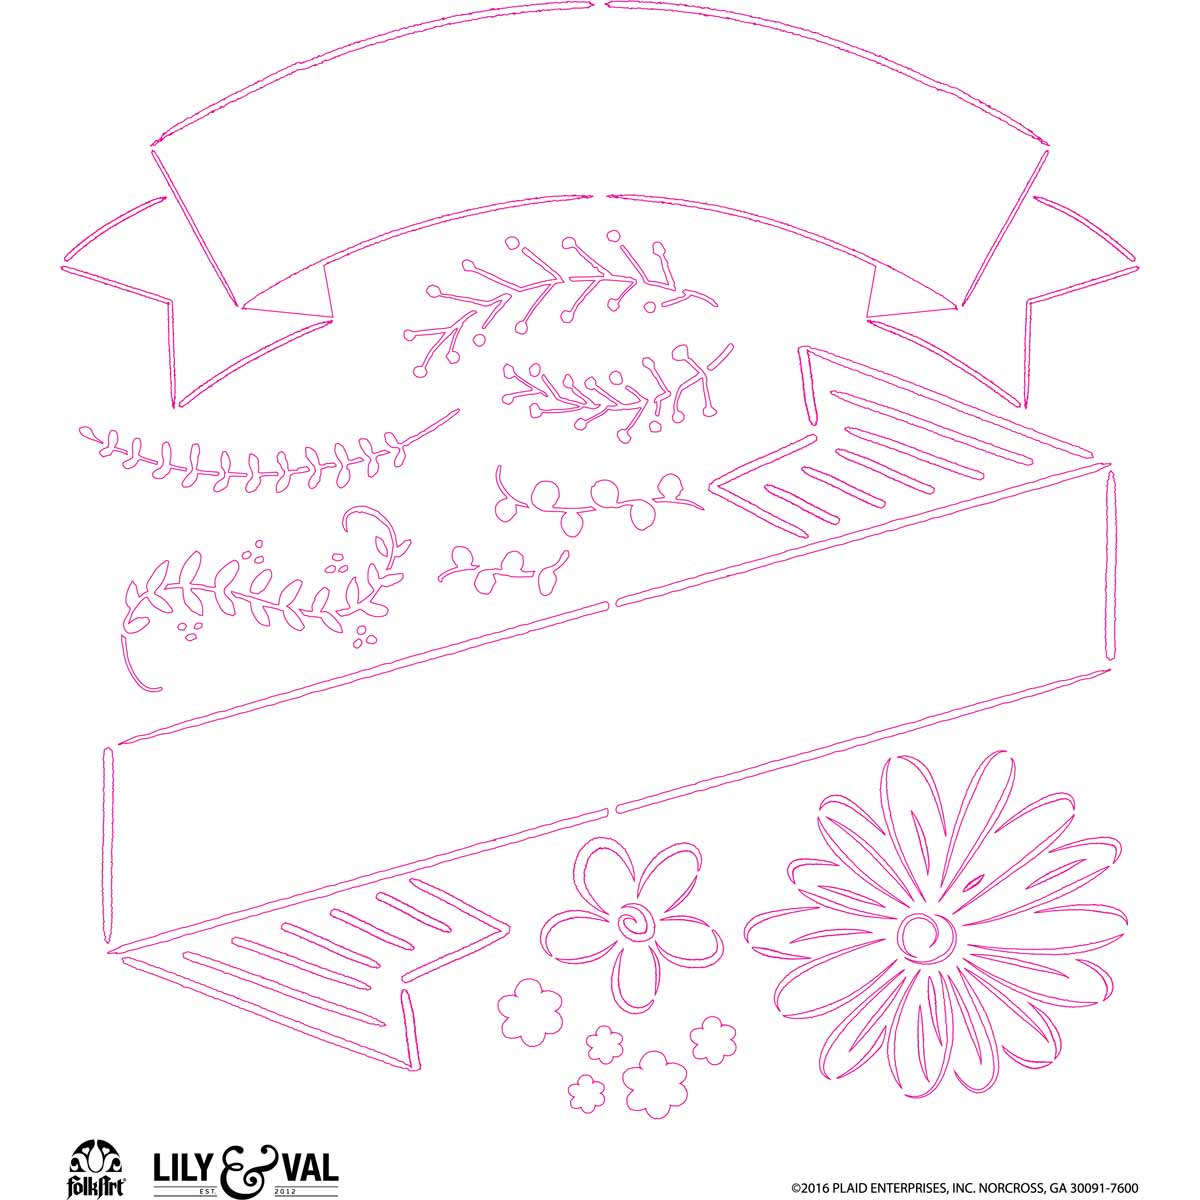 FolkArt ® Lily & Val™ Stencils - Variety Packs - Mixed Fonts